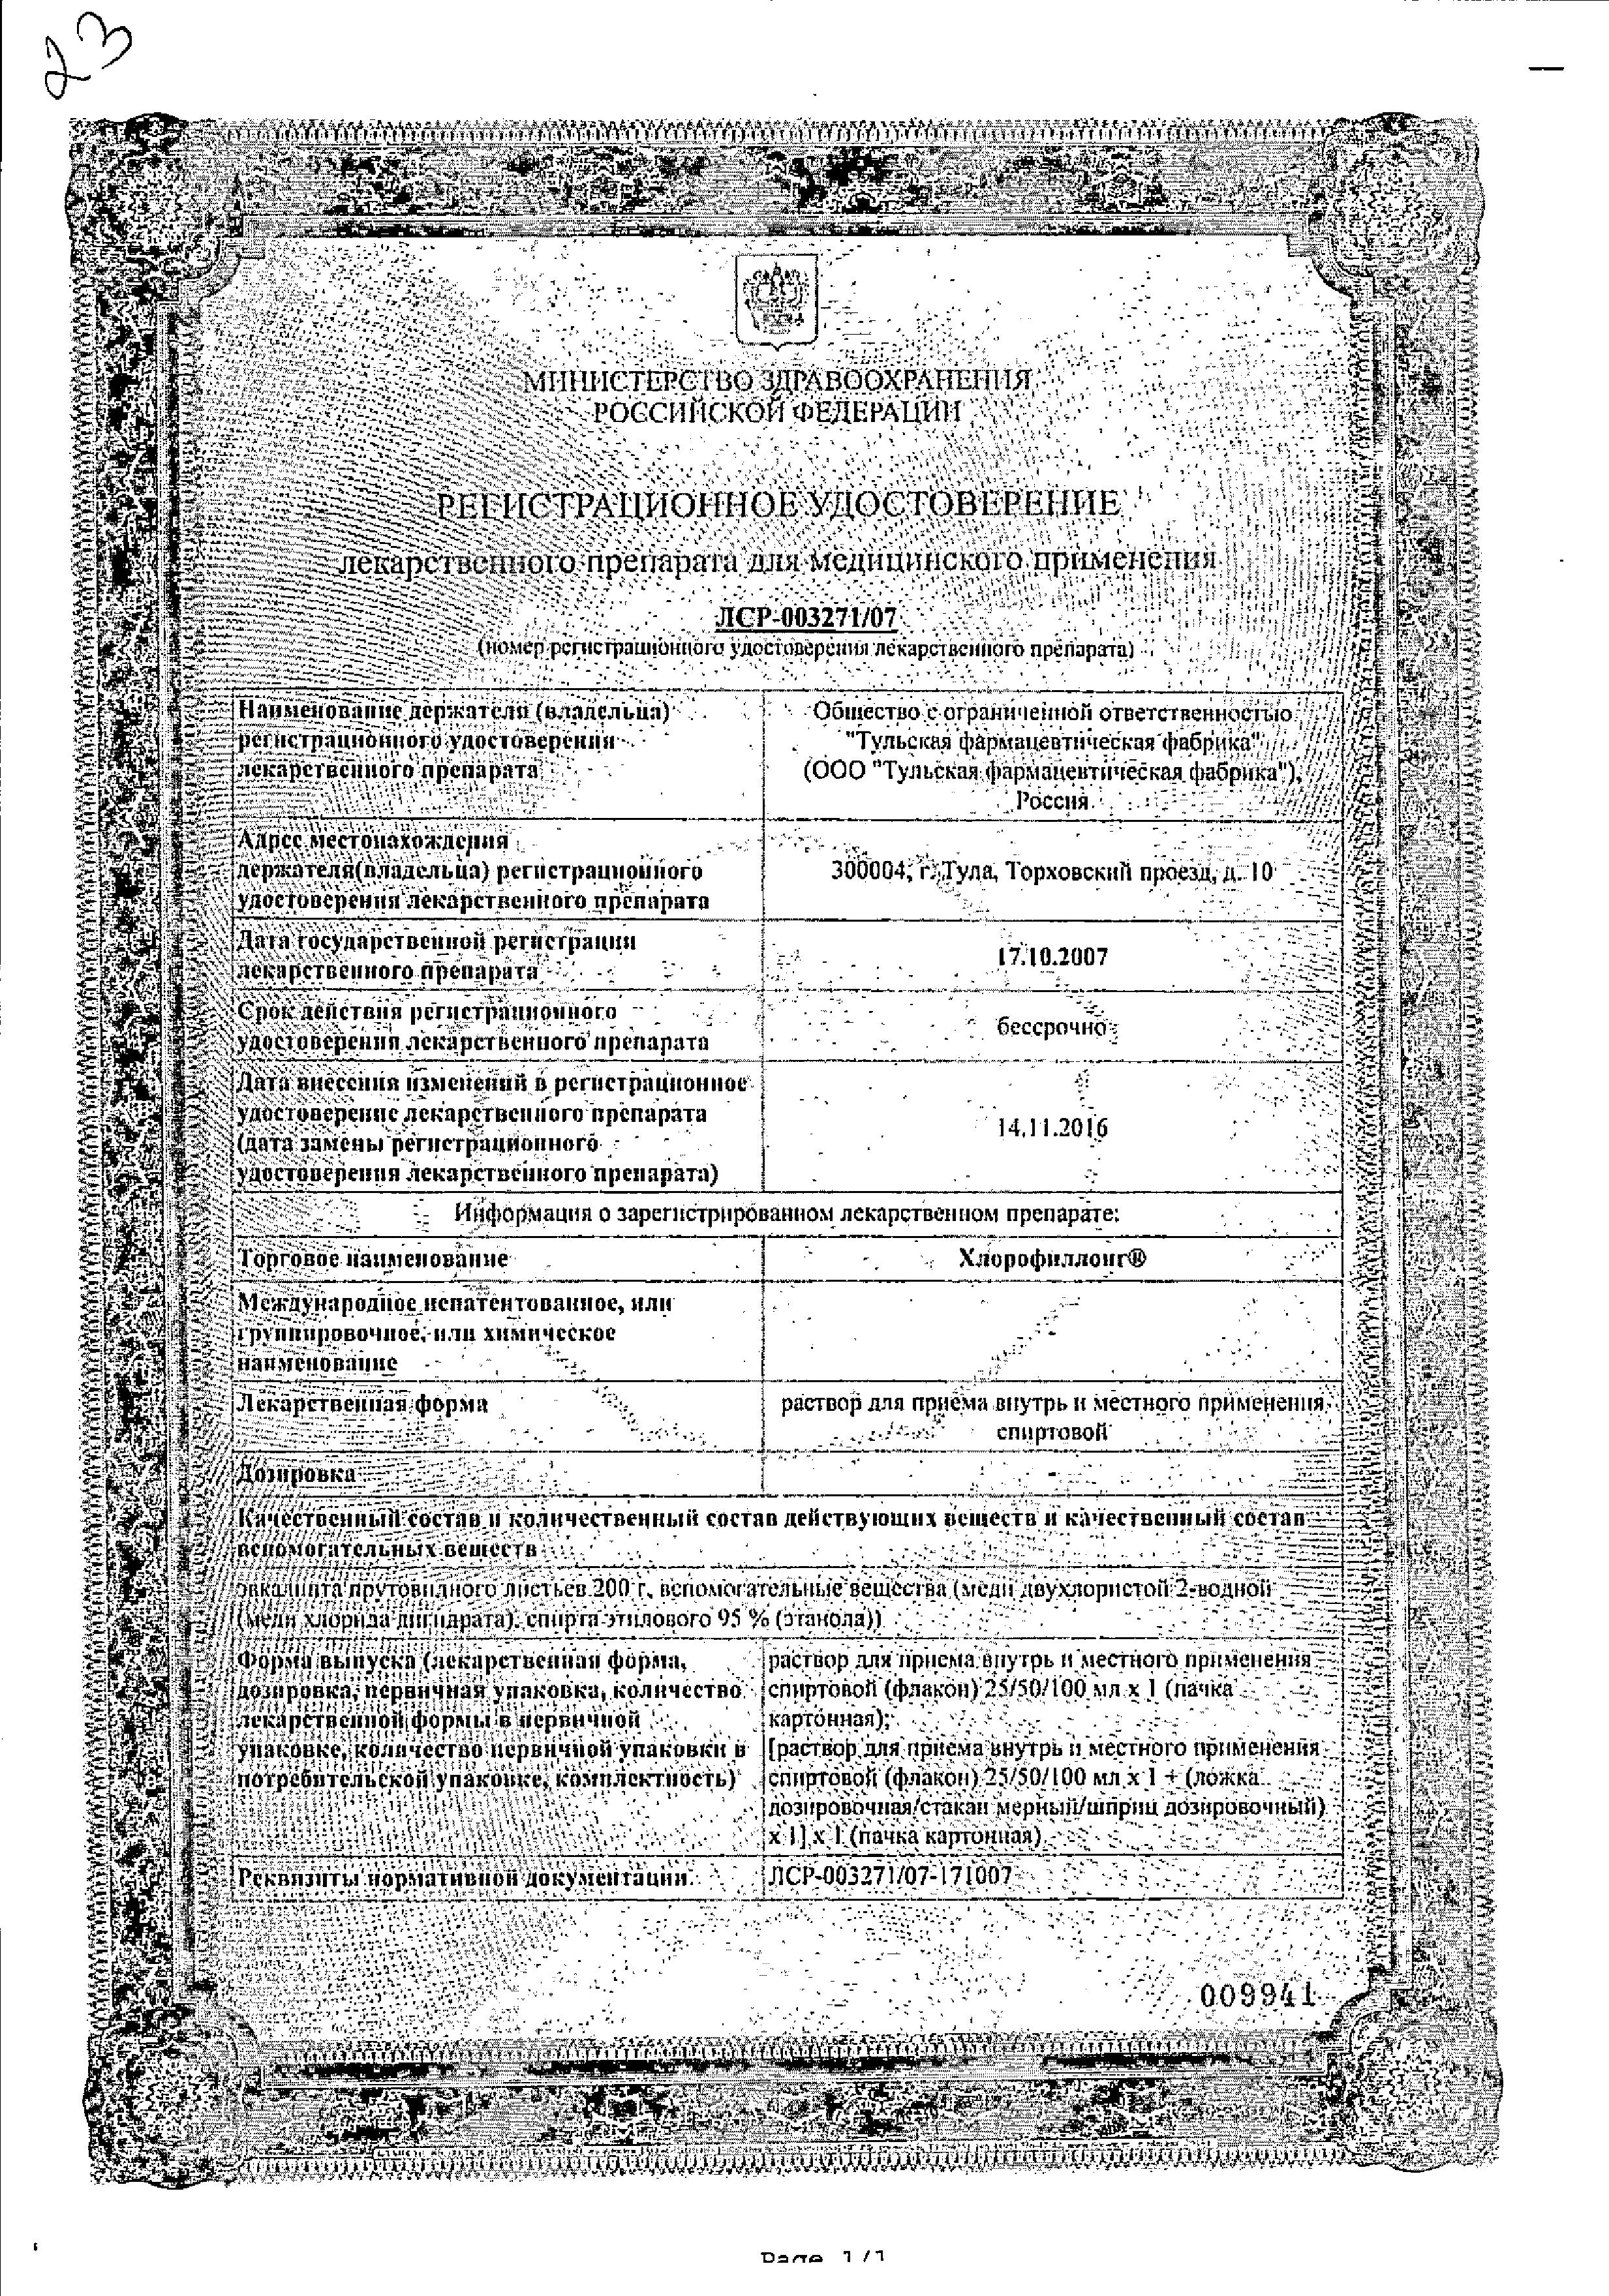 Хлорофиллонг сертификат